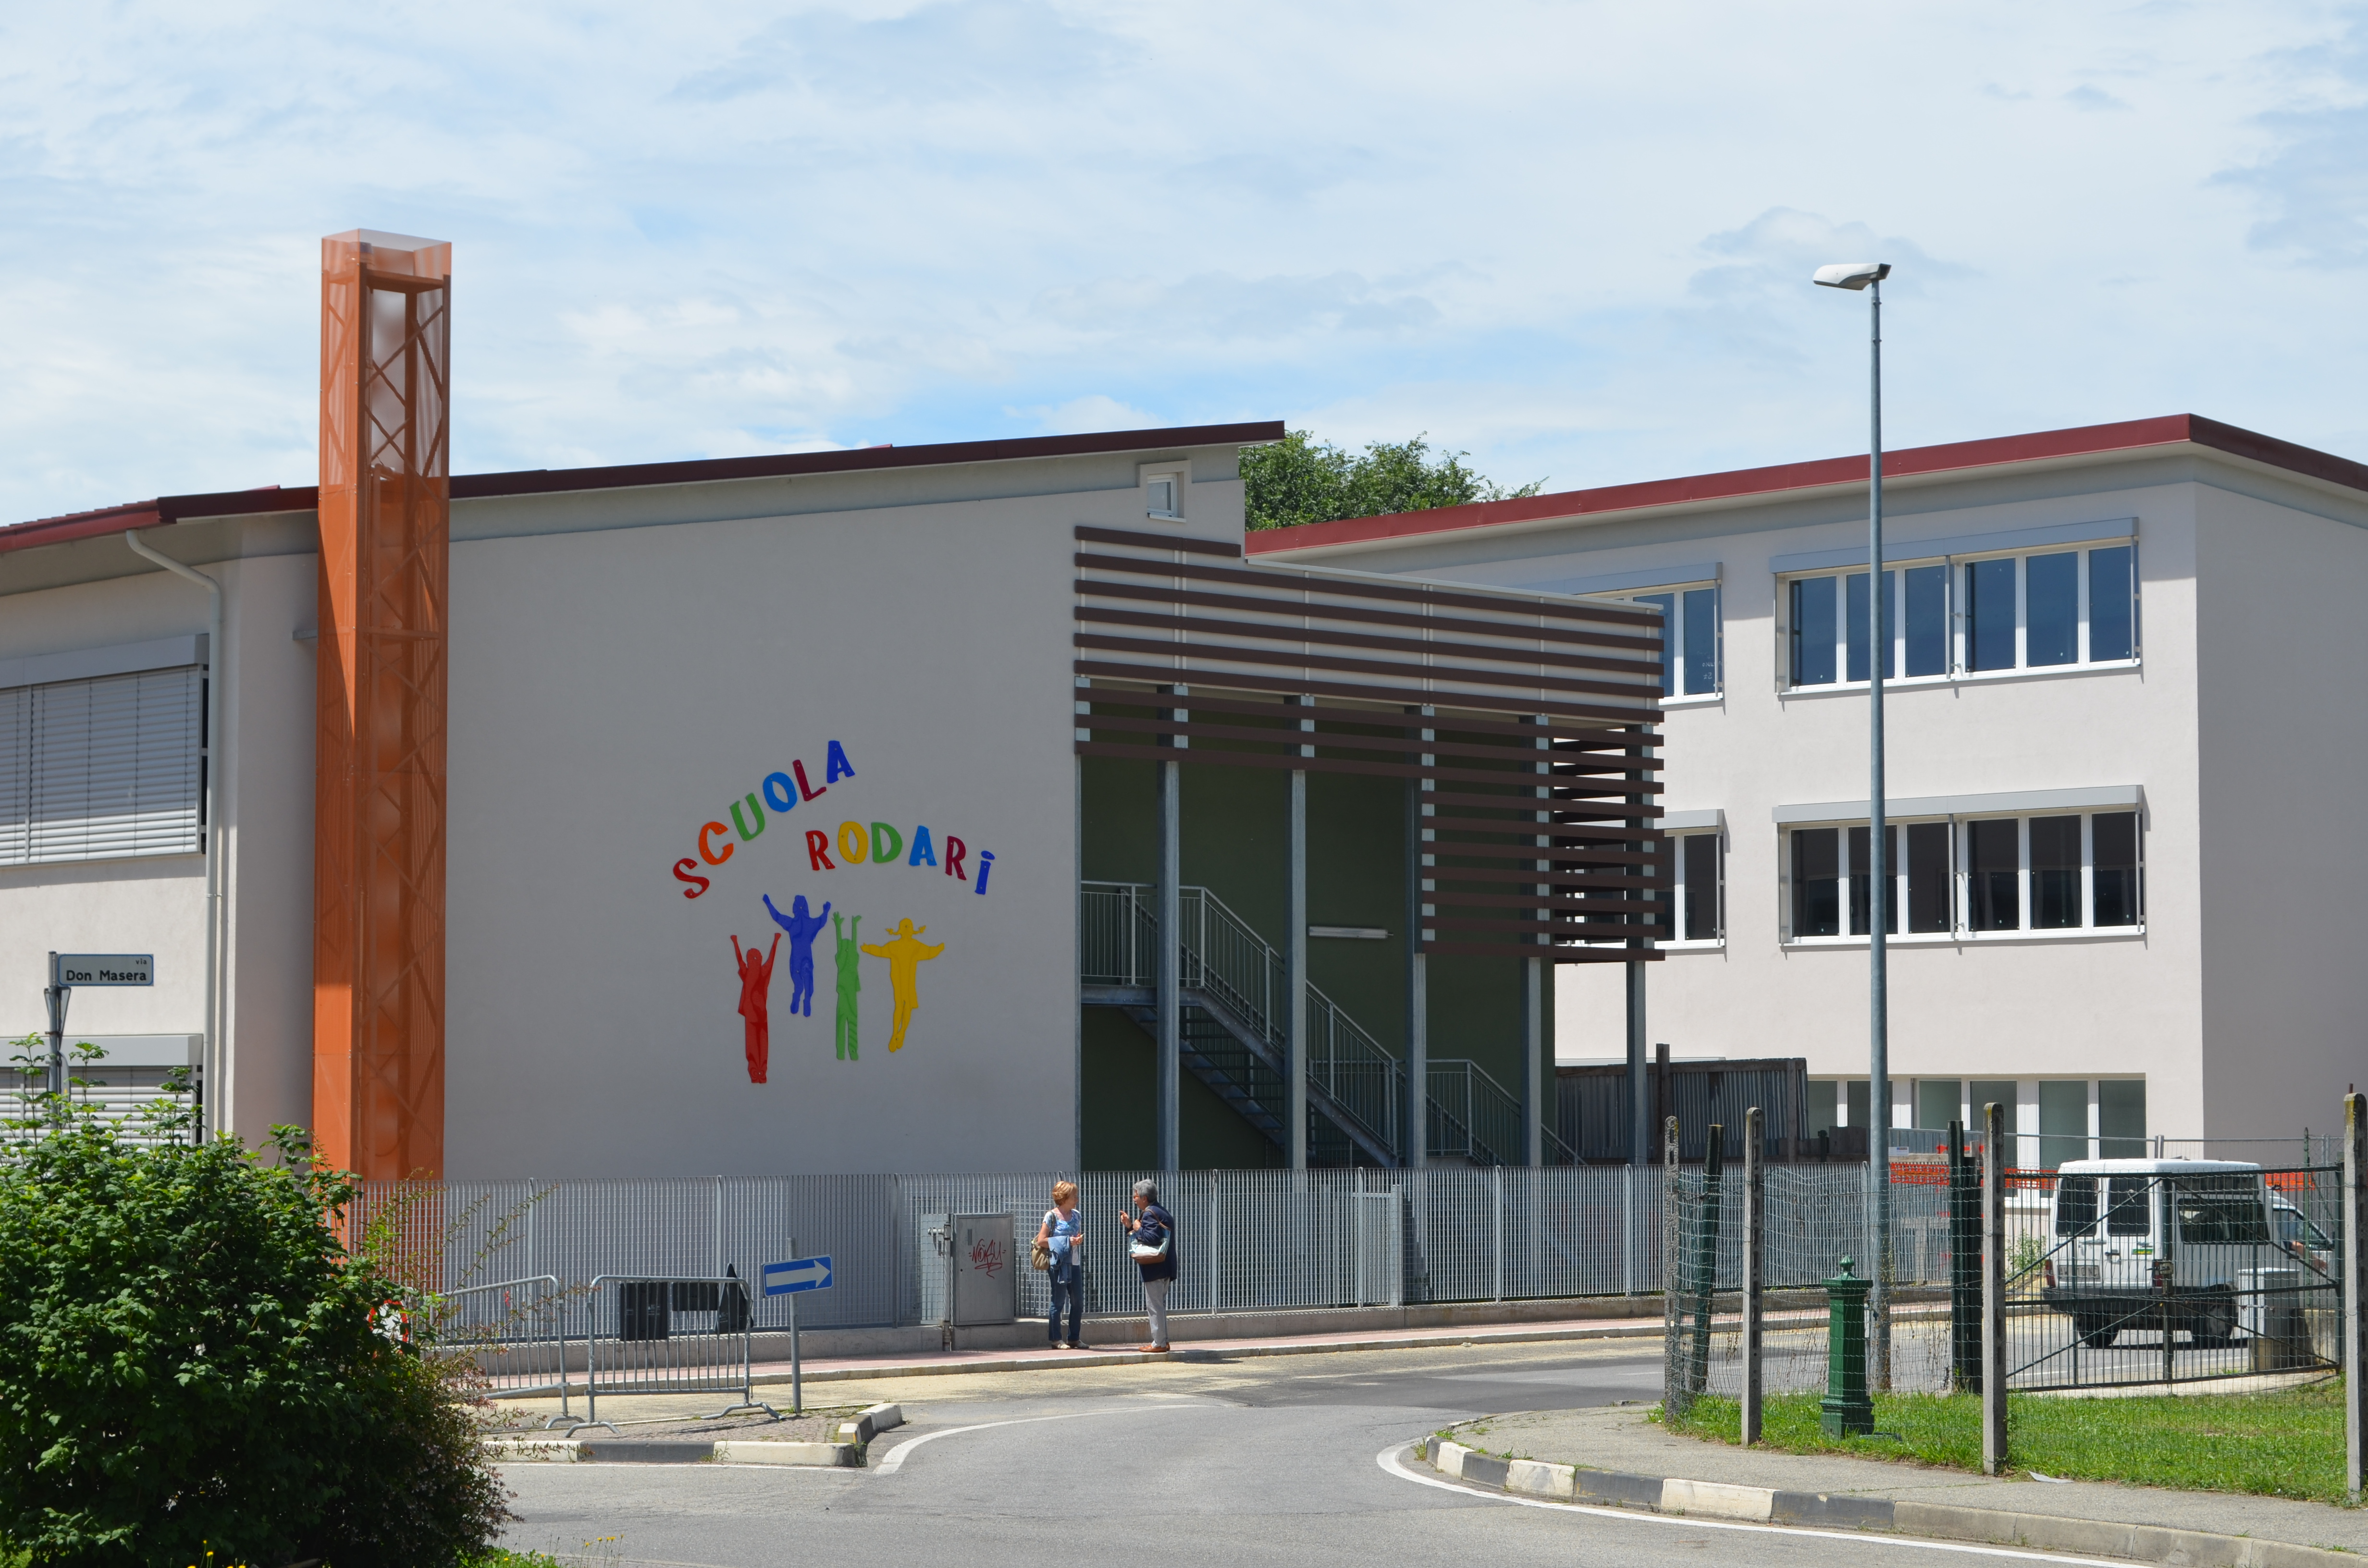 studio as Scuola elementare Rodari